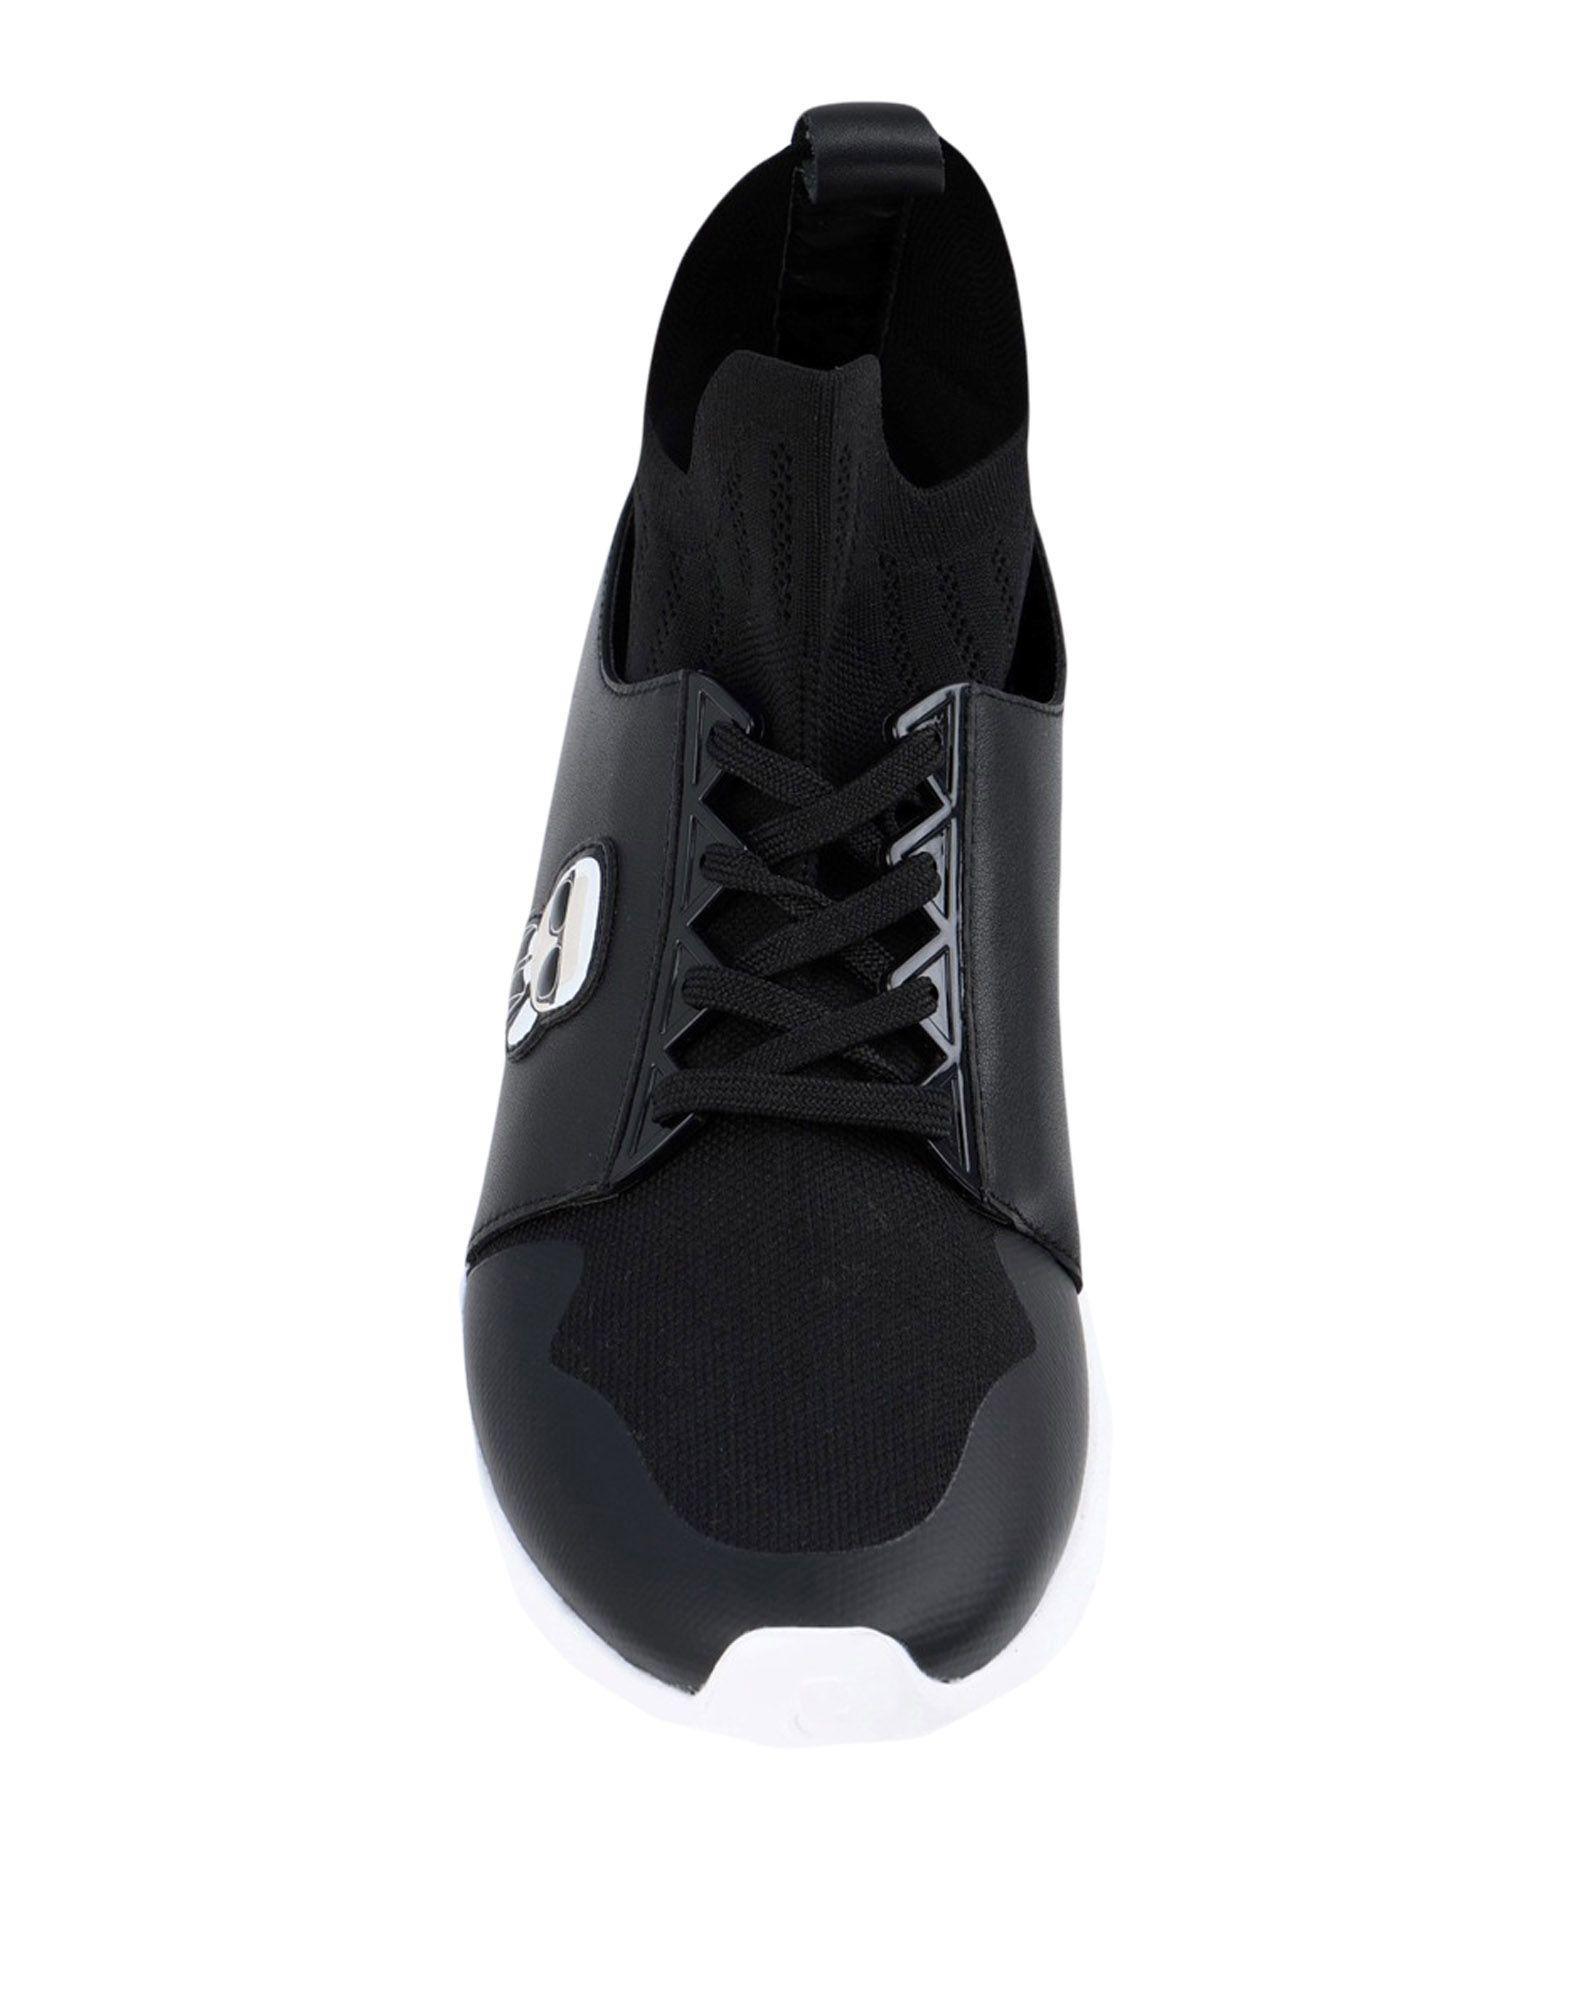 Sneakers & Deportivas Karl Lagerfeld de Tejido sintético de color Negro